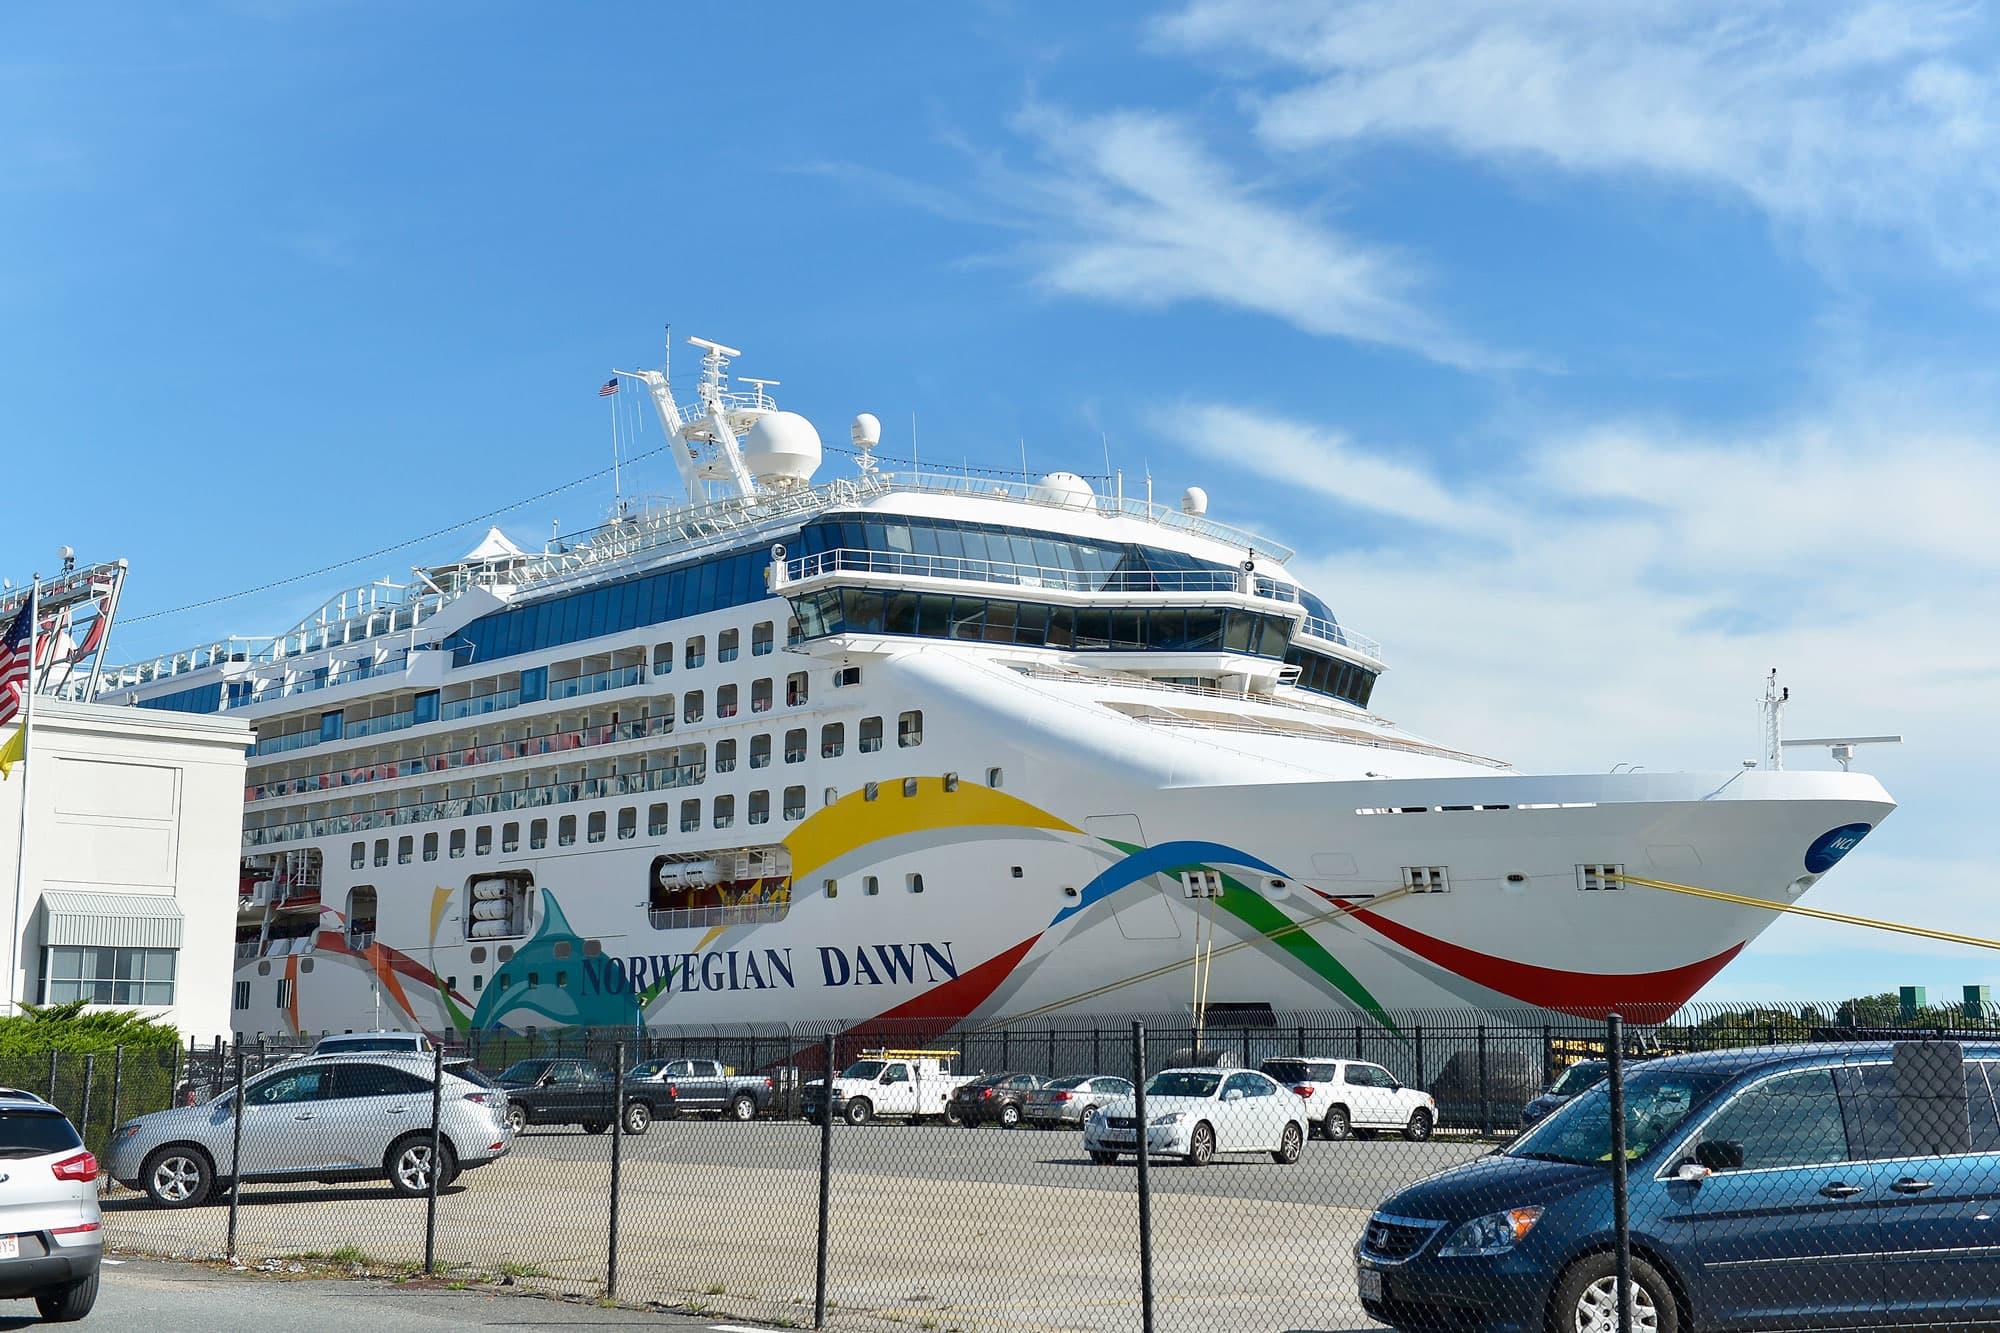 Cruise ships screen passengers and change routes to battle coronavirus threat